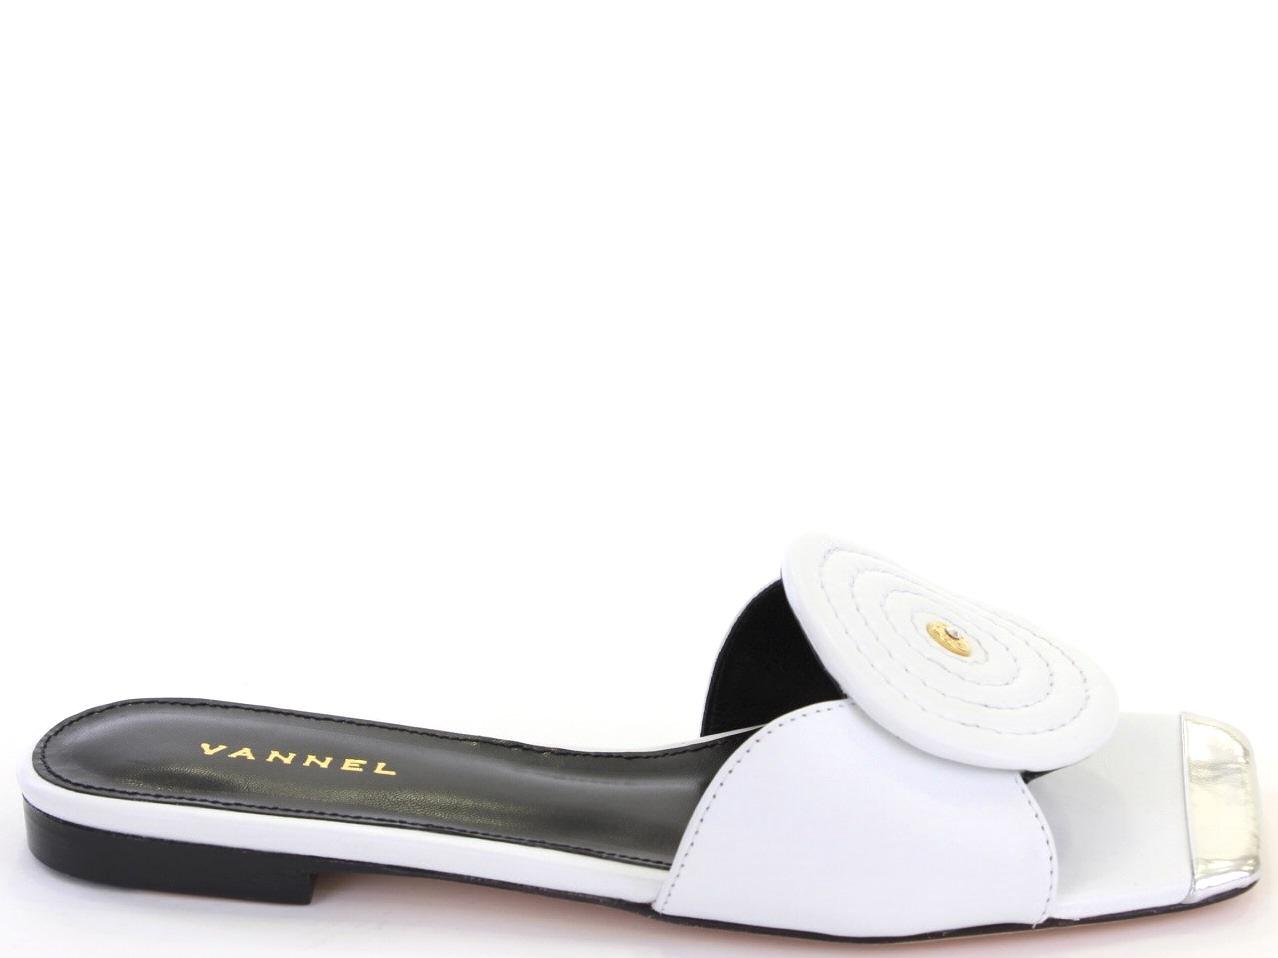 Sandálias Baixas Vannel - 001 9445